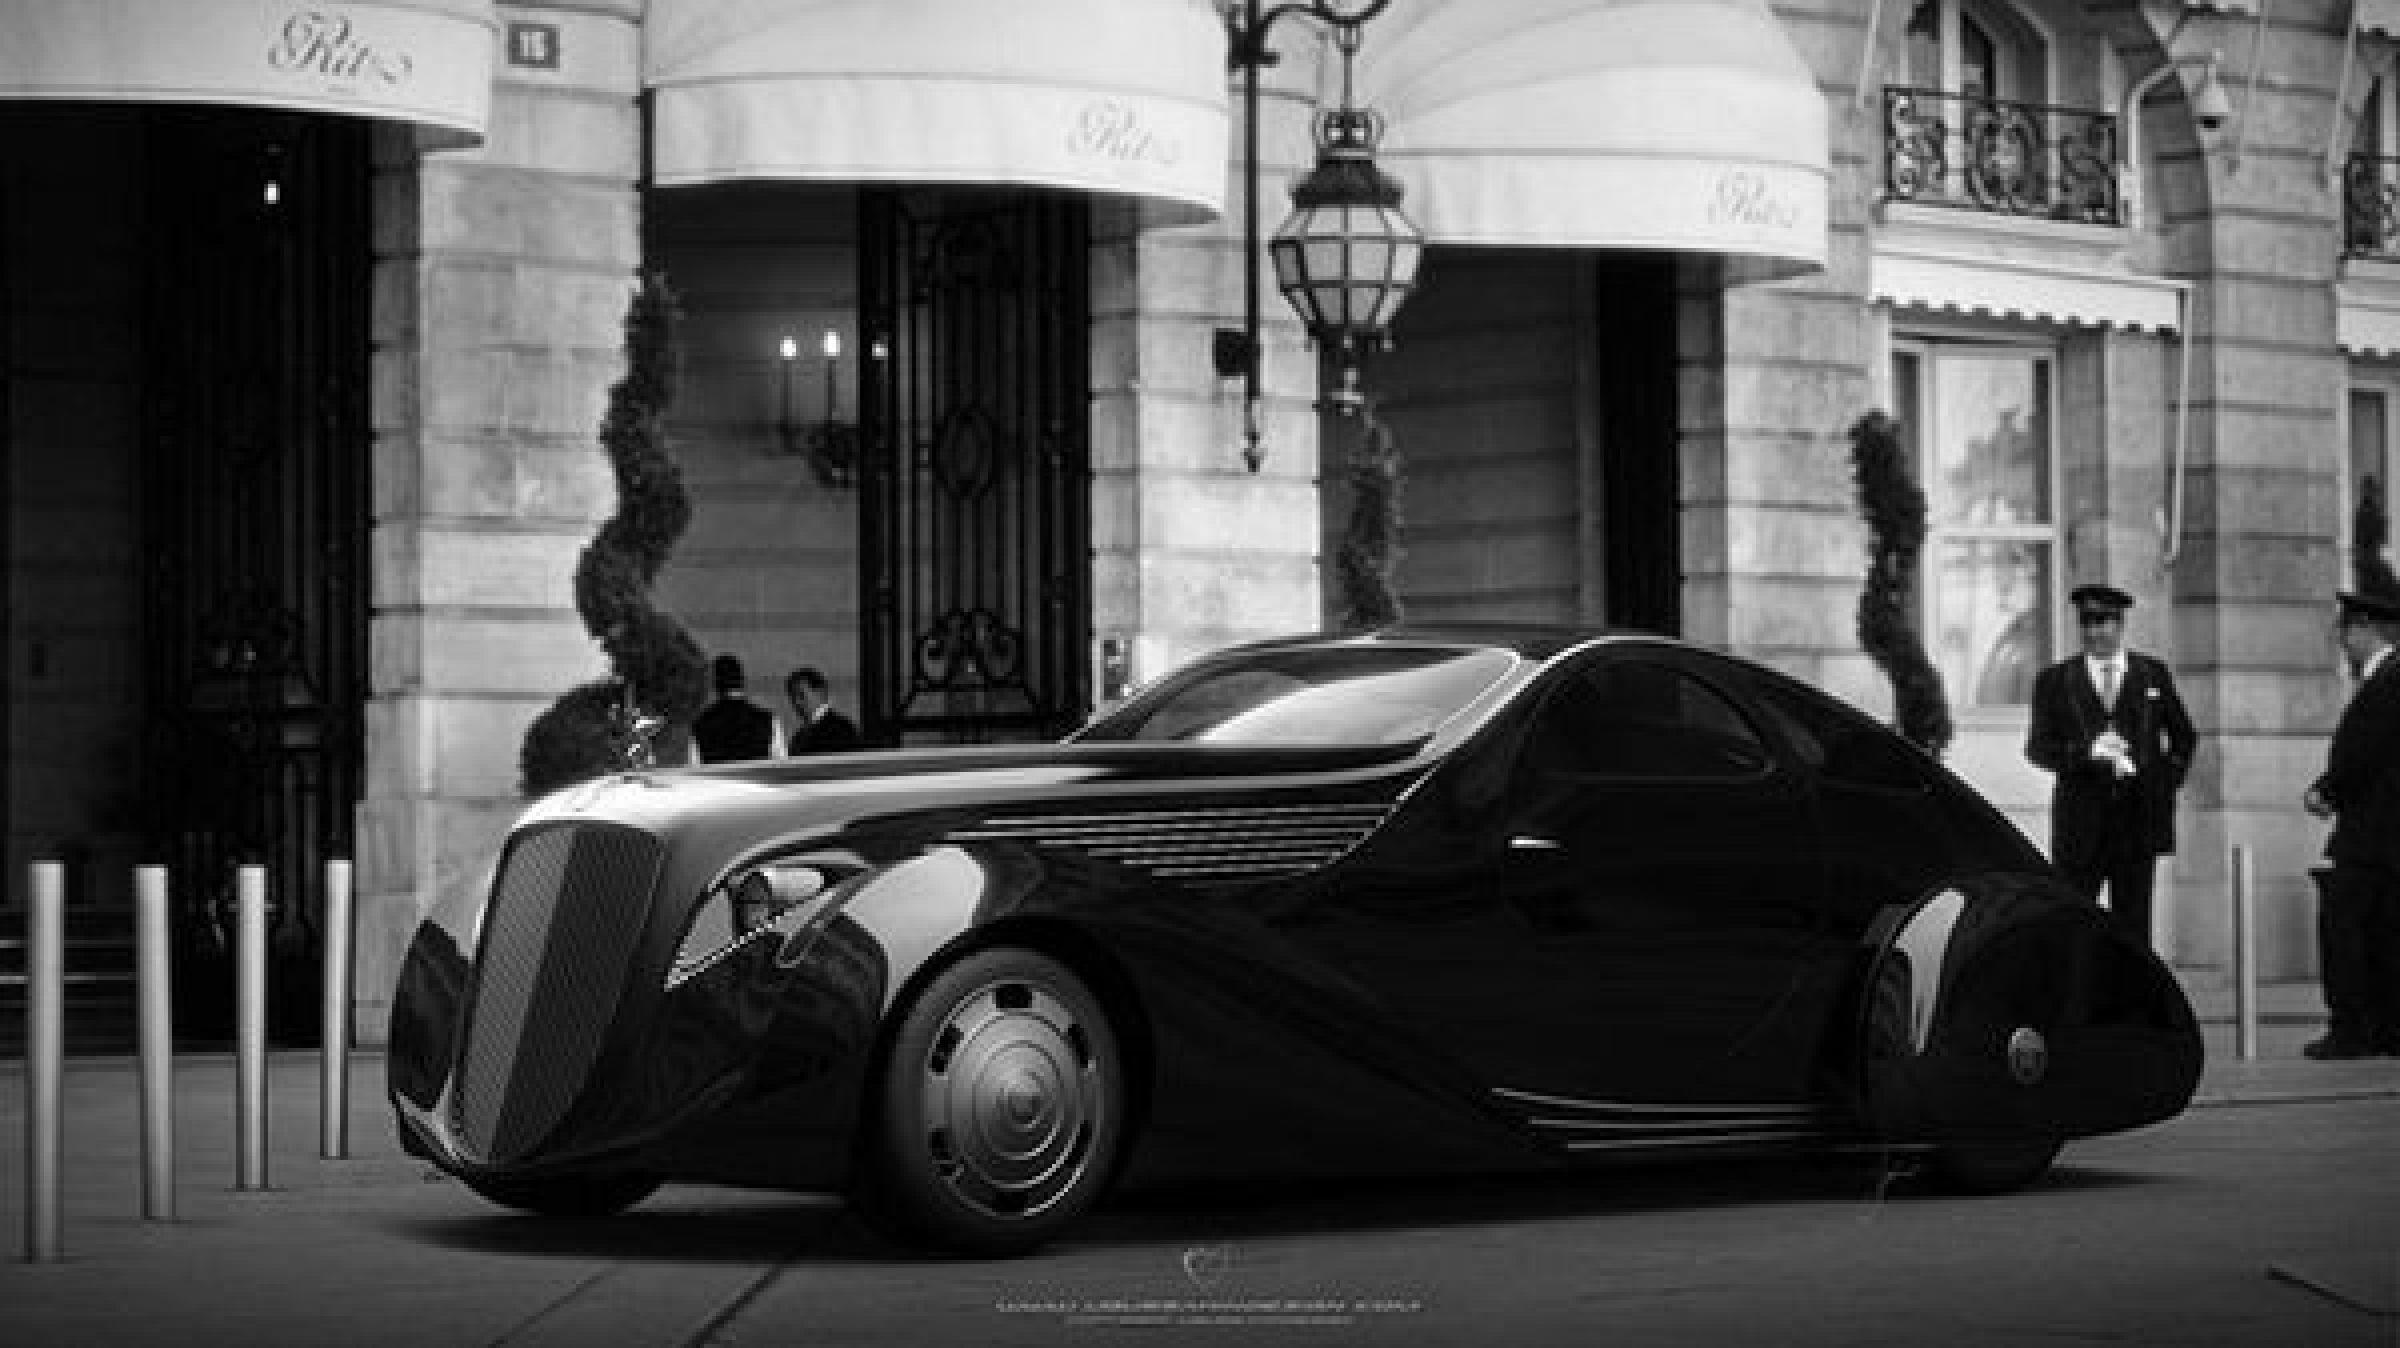 Rolls Royce Jonckheere Aerodynamic Coupe Ii Ugur Sahin Arch2o Com